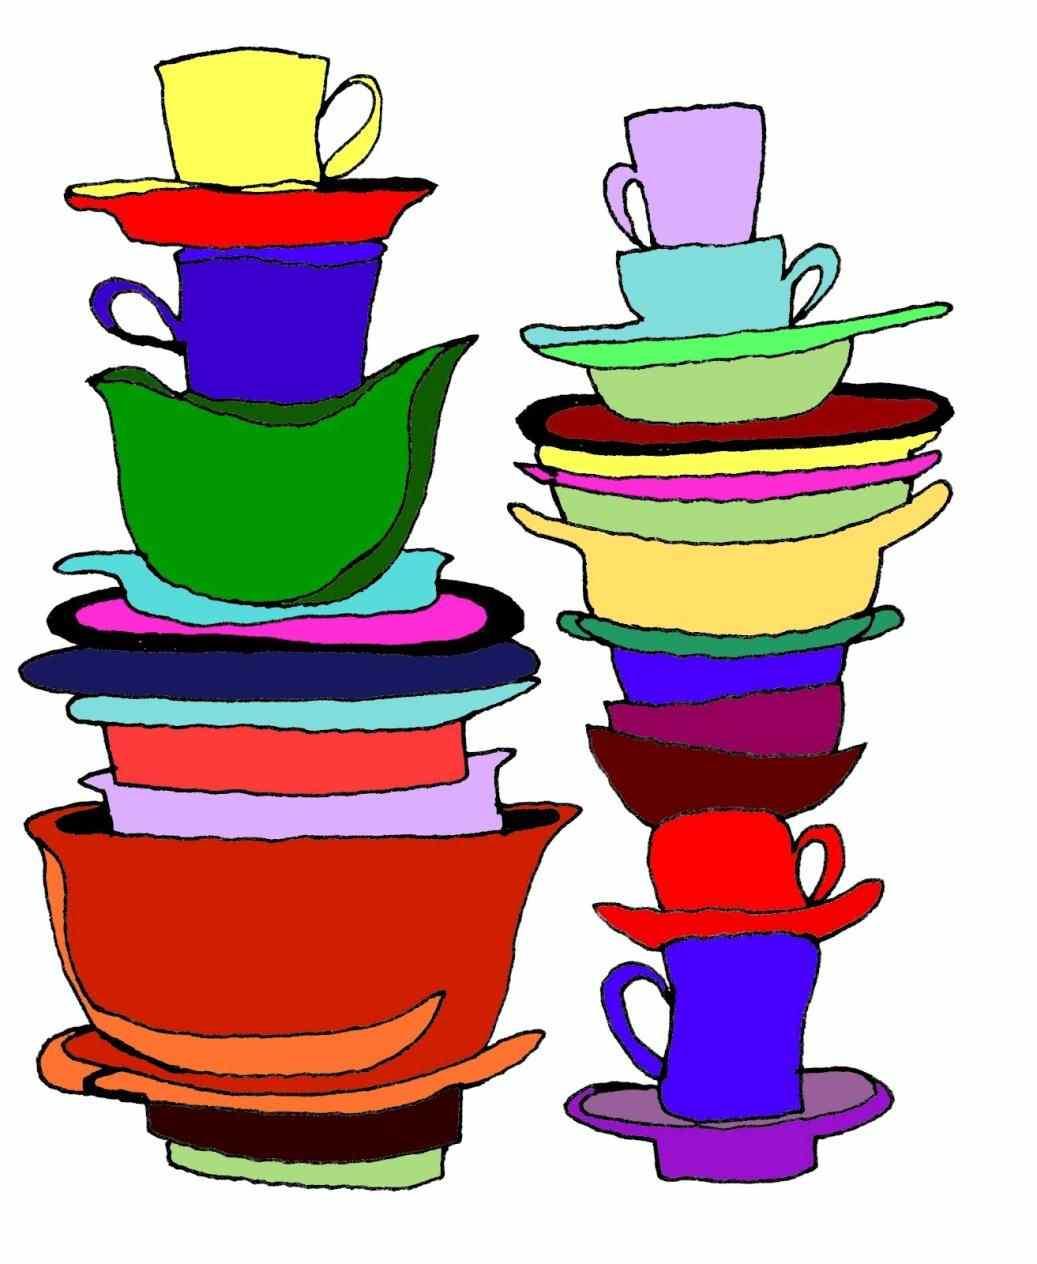 1037x1264 Kitchen And Brand Lab S Clean Kitchen Clip Art Cut Calories Food